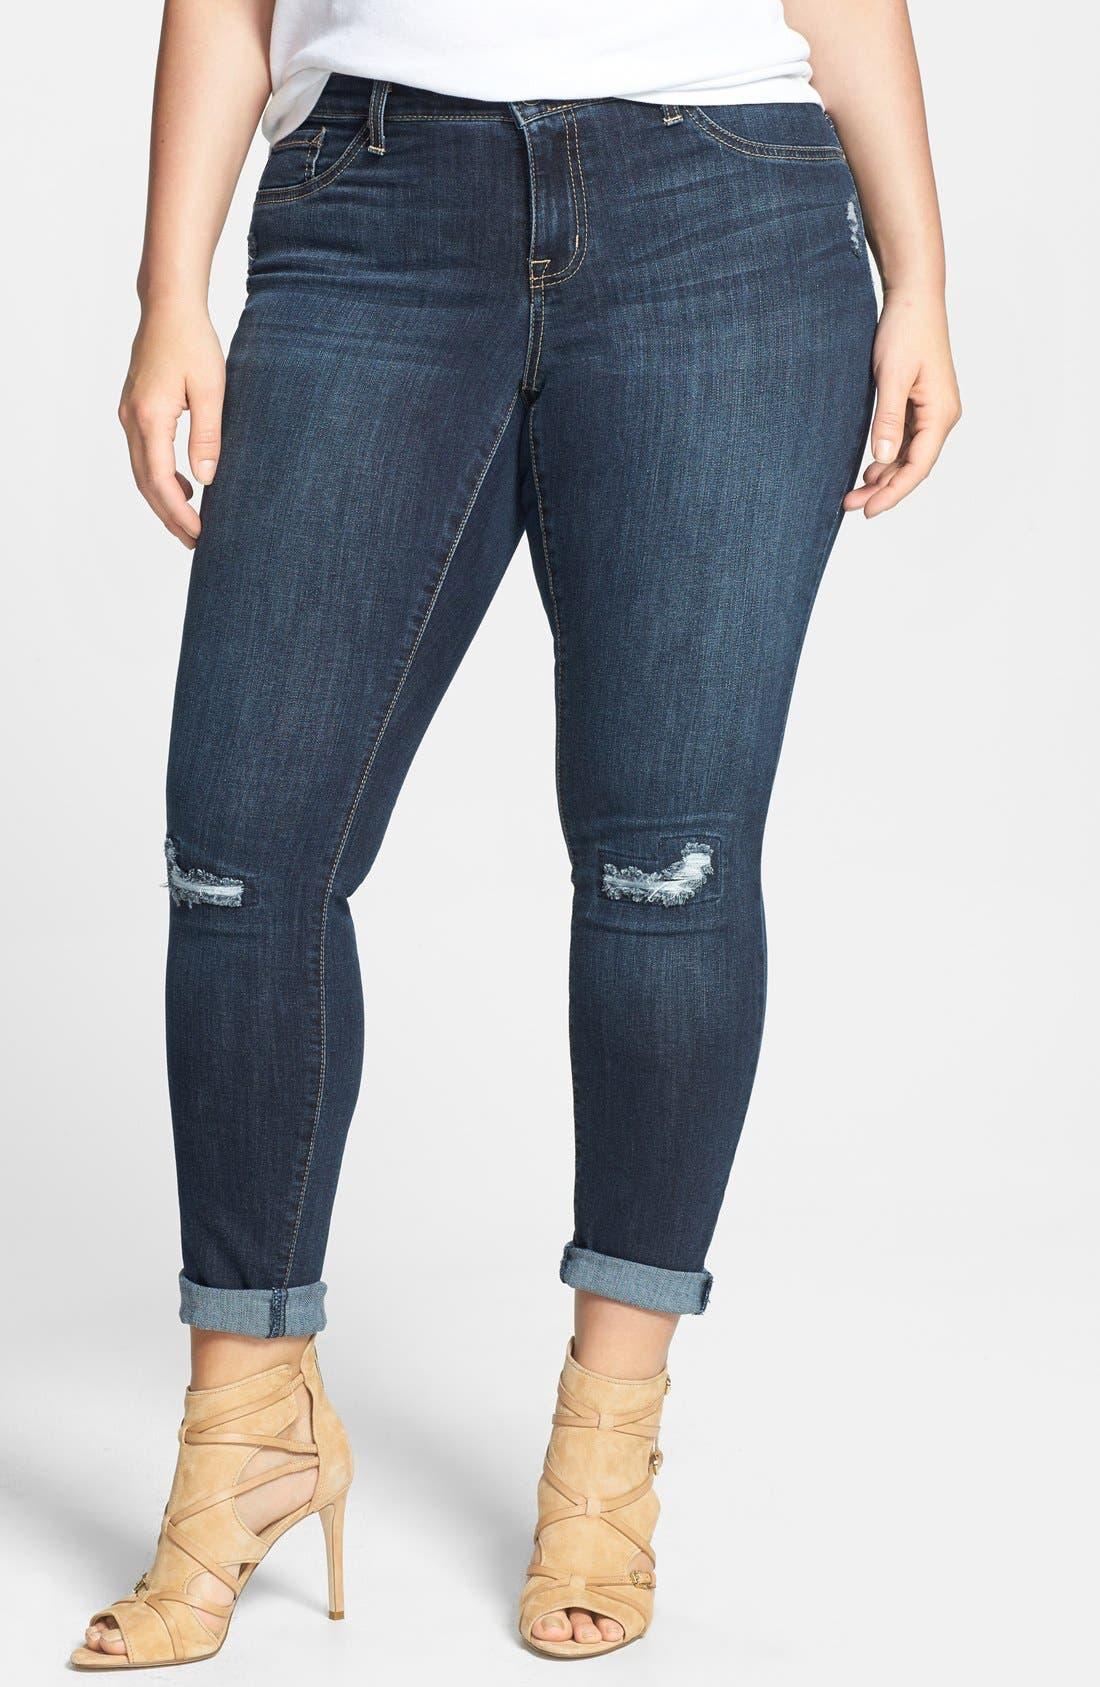 Main Image - Jessica Simpson 'Kiss Me' Stretch Skinny Jeans (Plus Size)